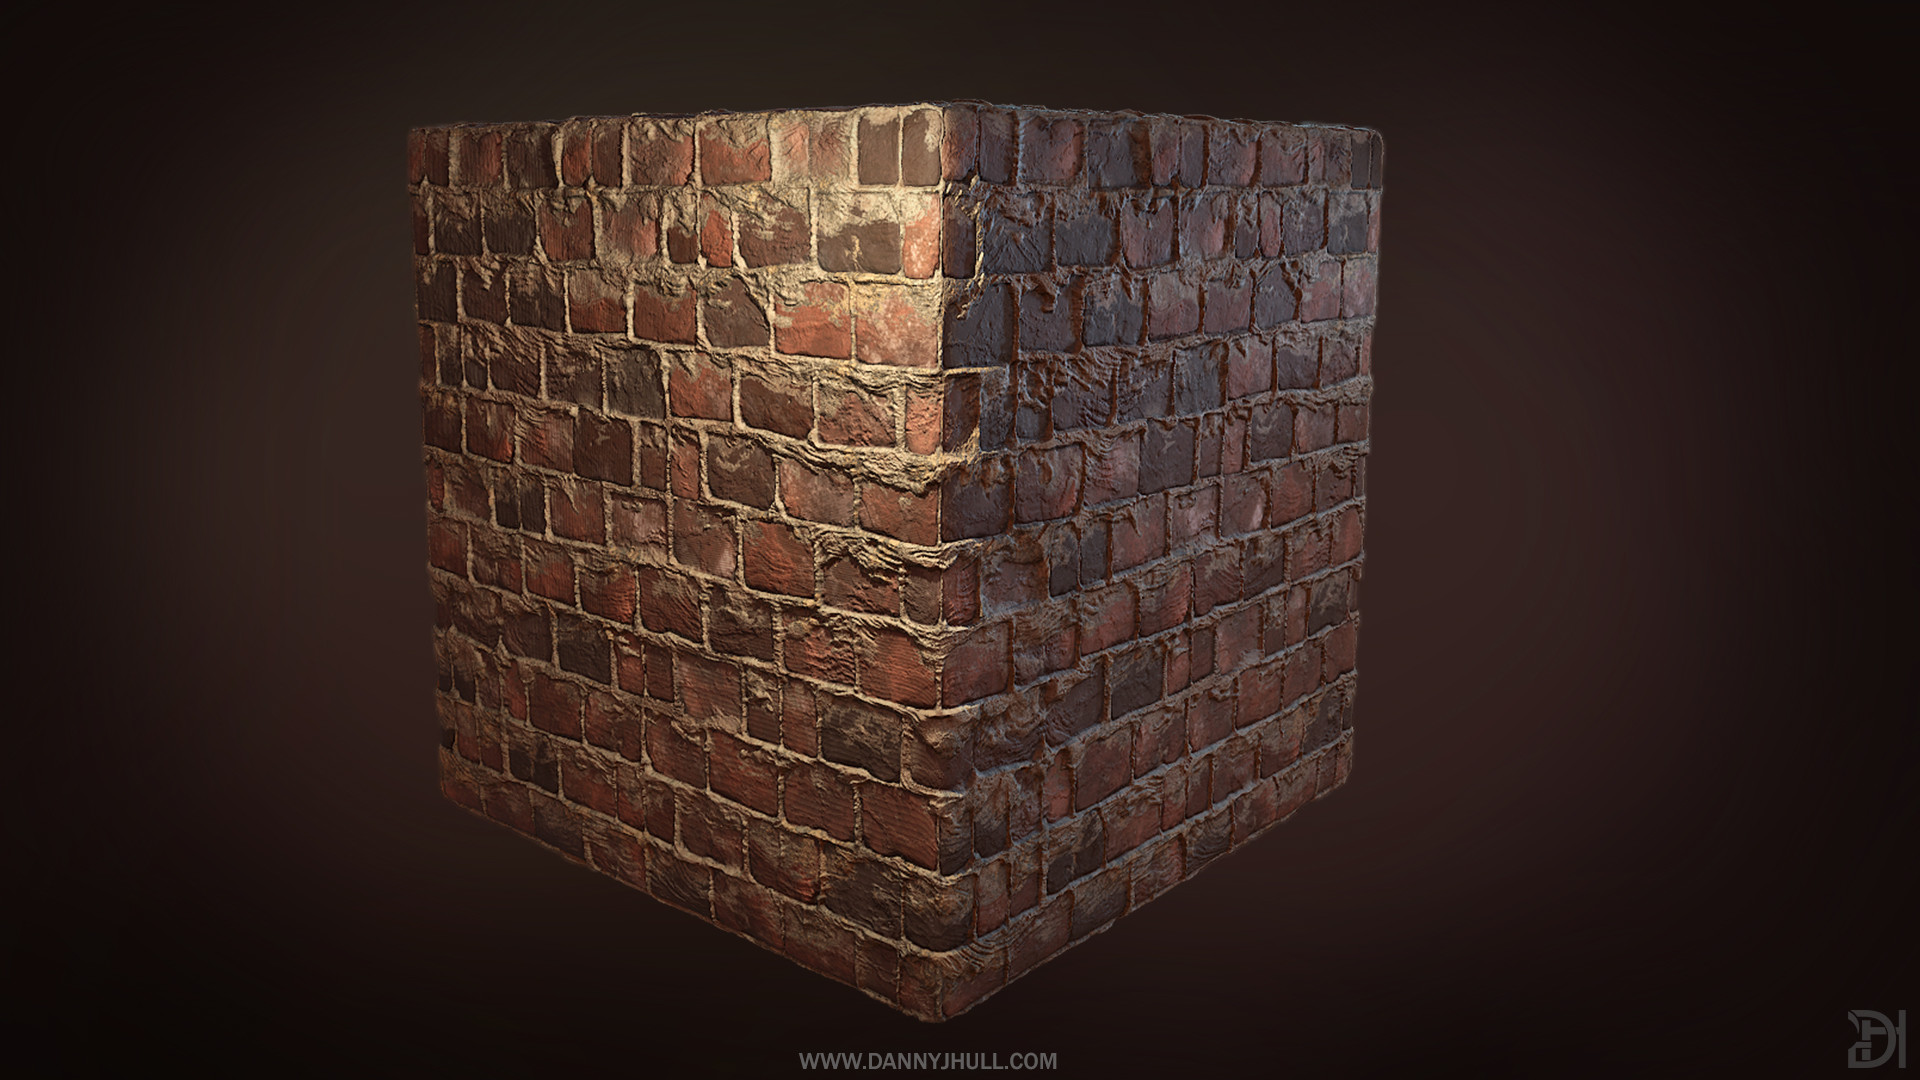 Daniel hull birck wall 2